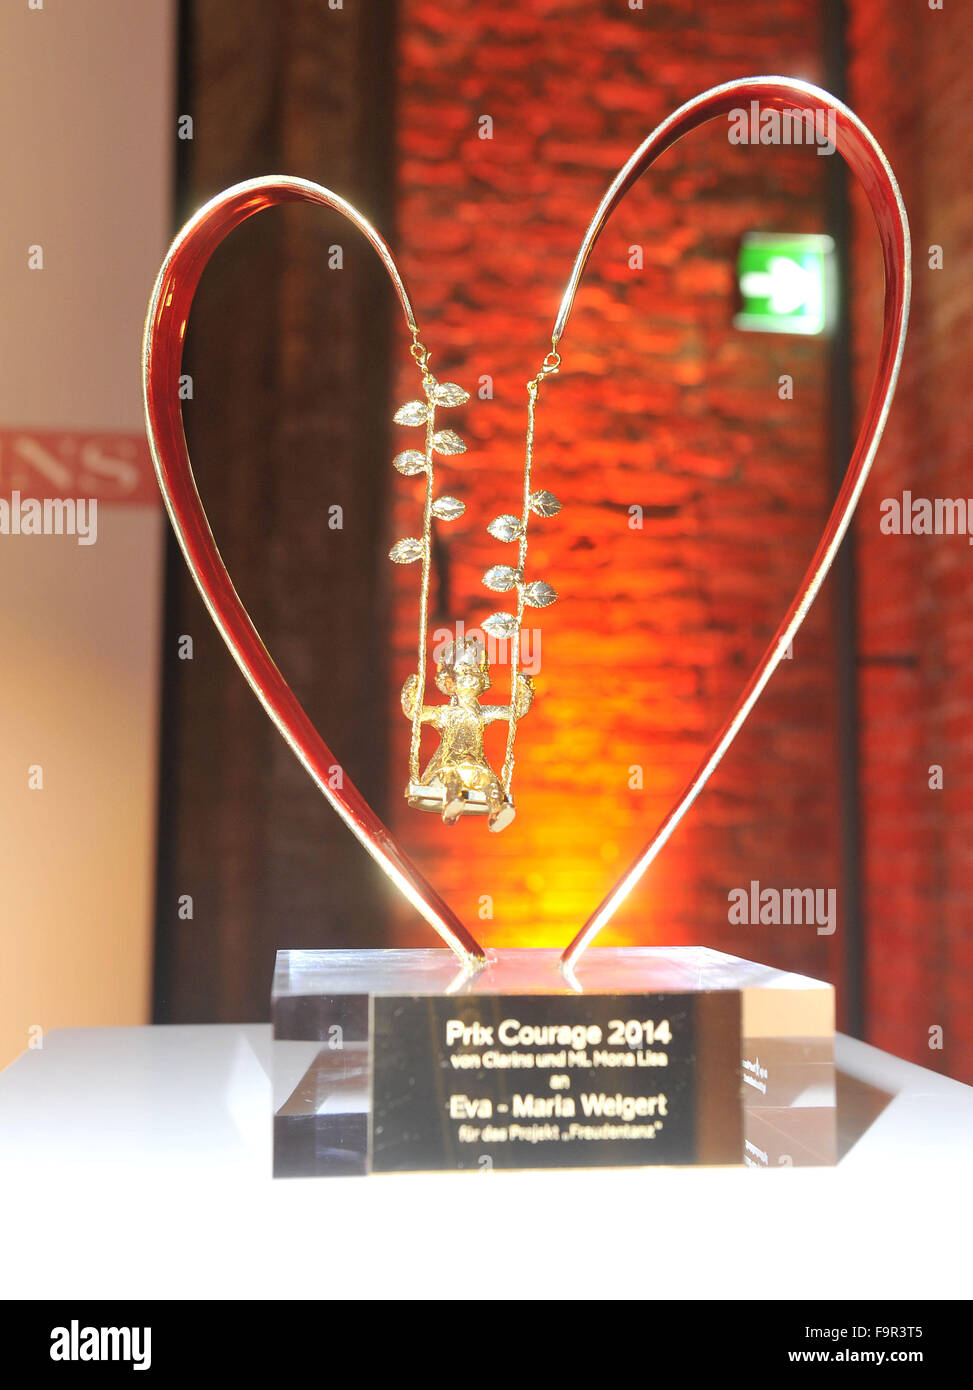 11th annual prix courage award at allerheiligen hofkirche church stock photo royalty free image. Black Bedroom Furniture Sets. Home Design Ideas